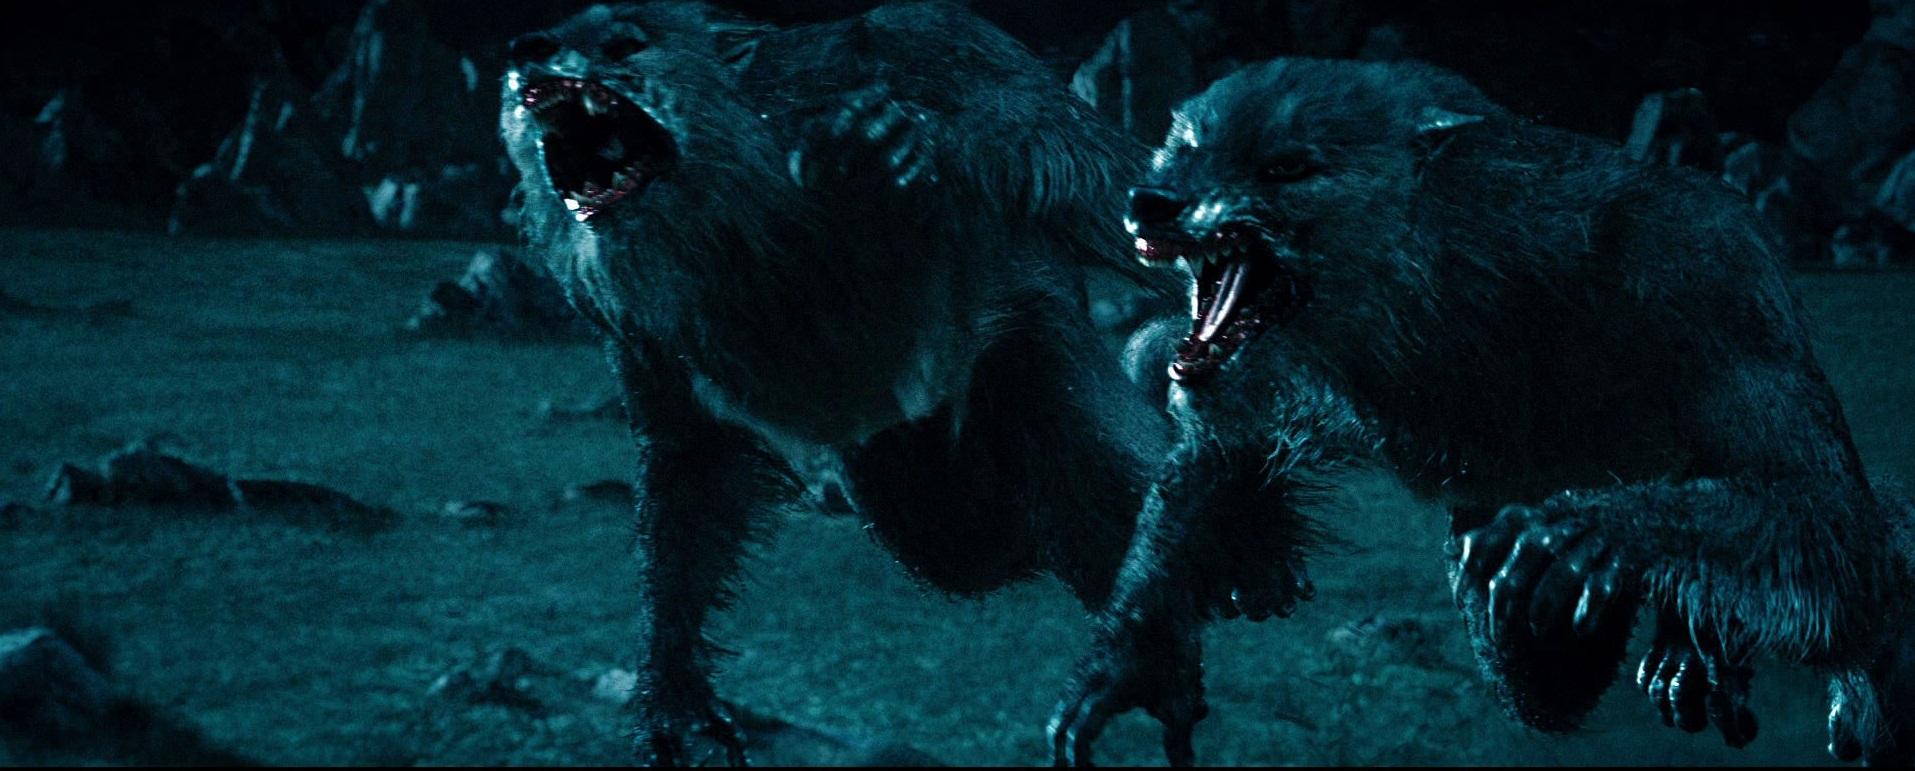 Werewolf | Underworld Wiki | FANDOM powered by Wikia